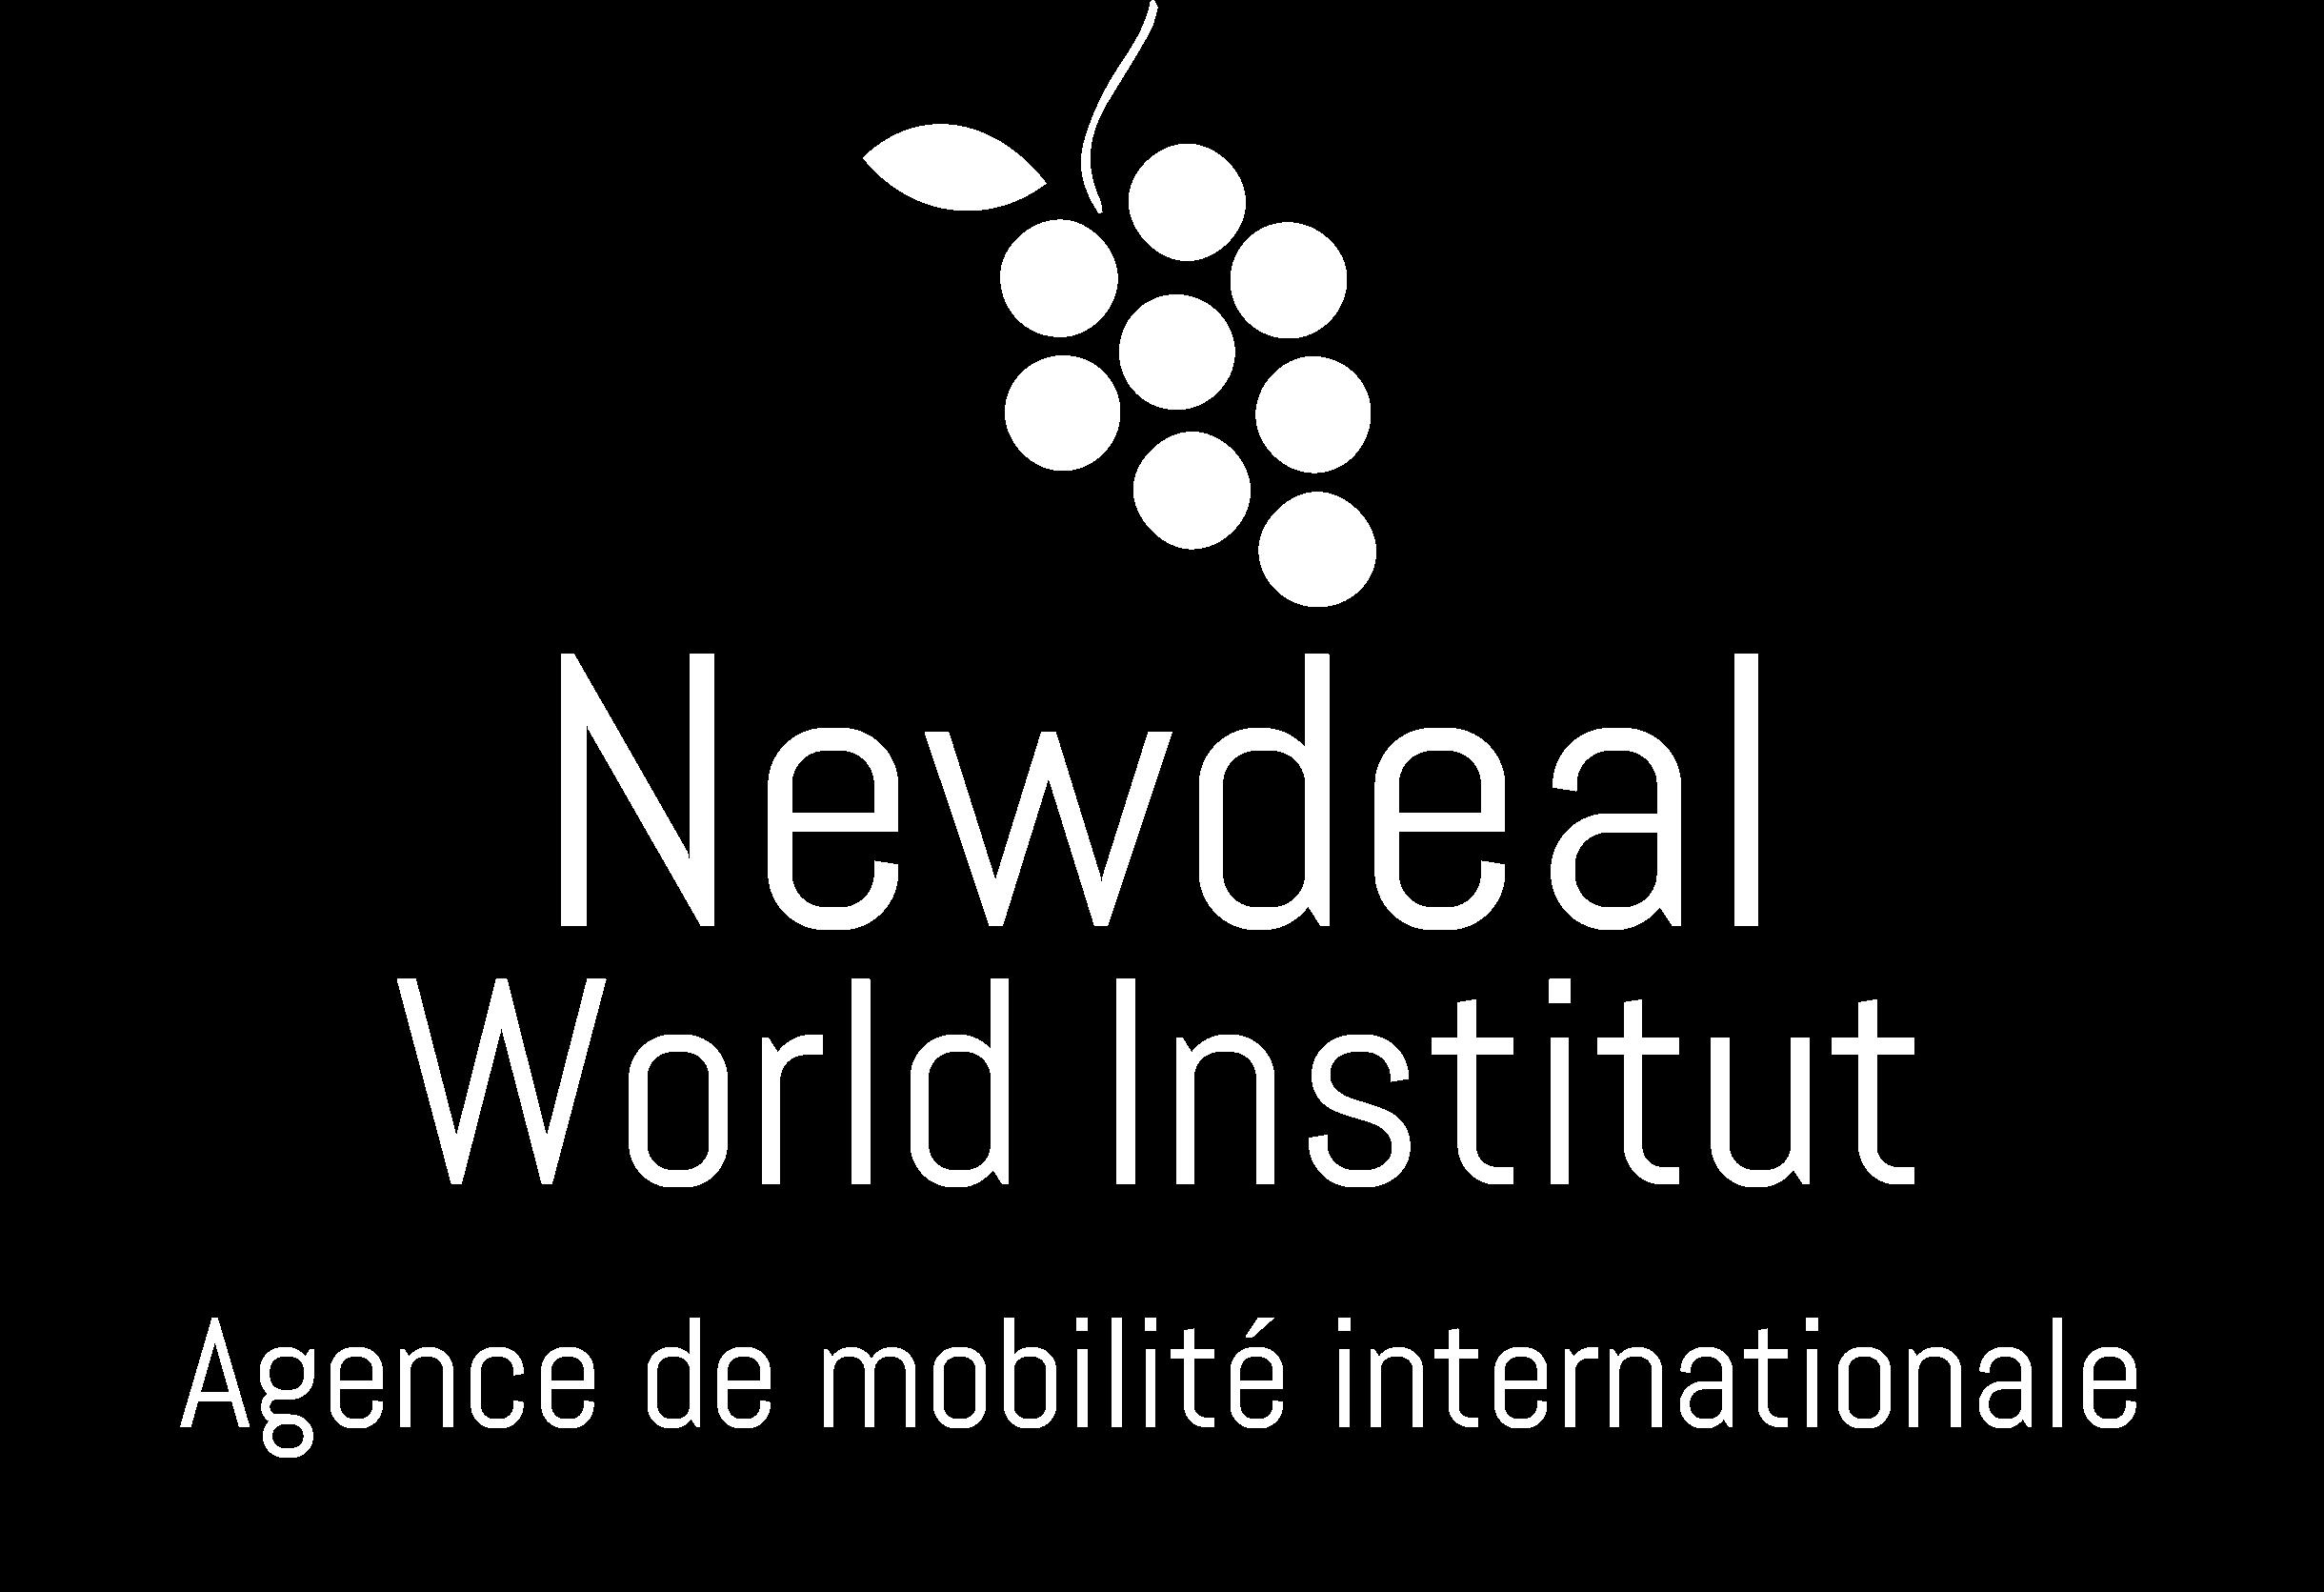 Newdeal World Institut - Agence de Mobilité Internationale